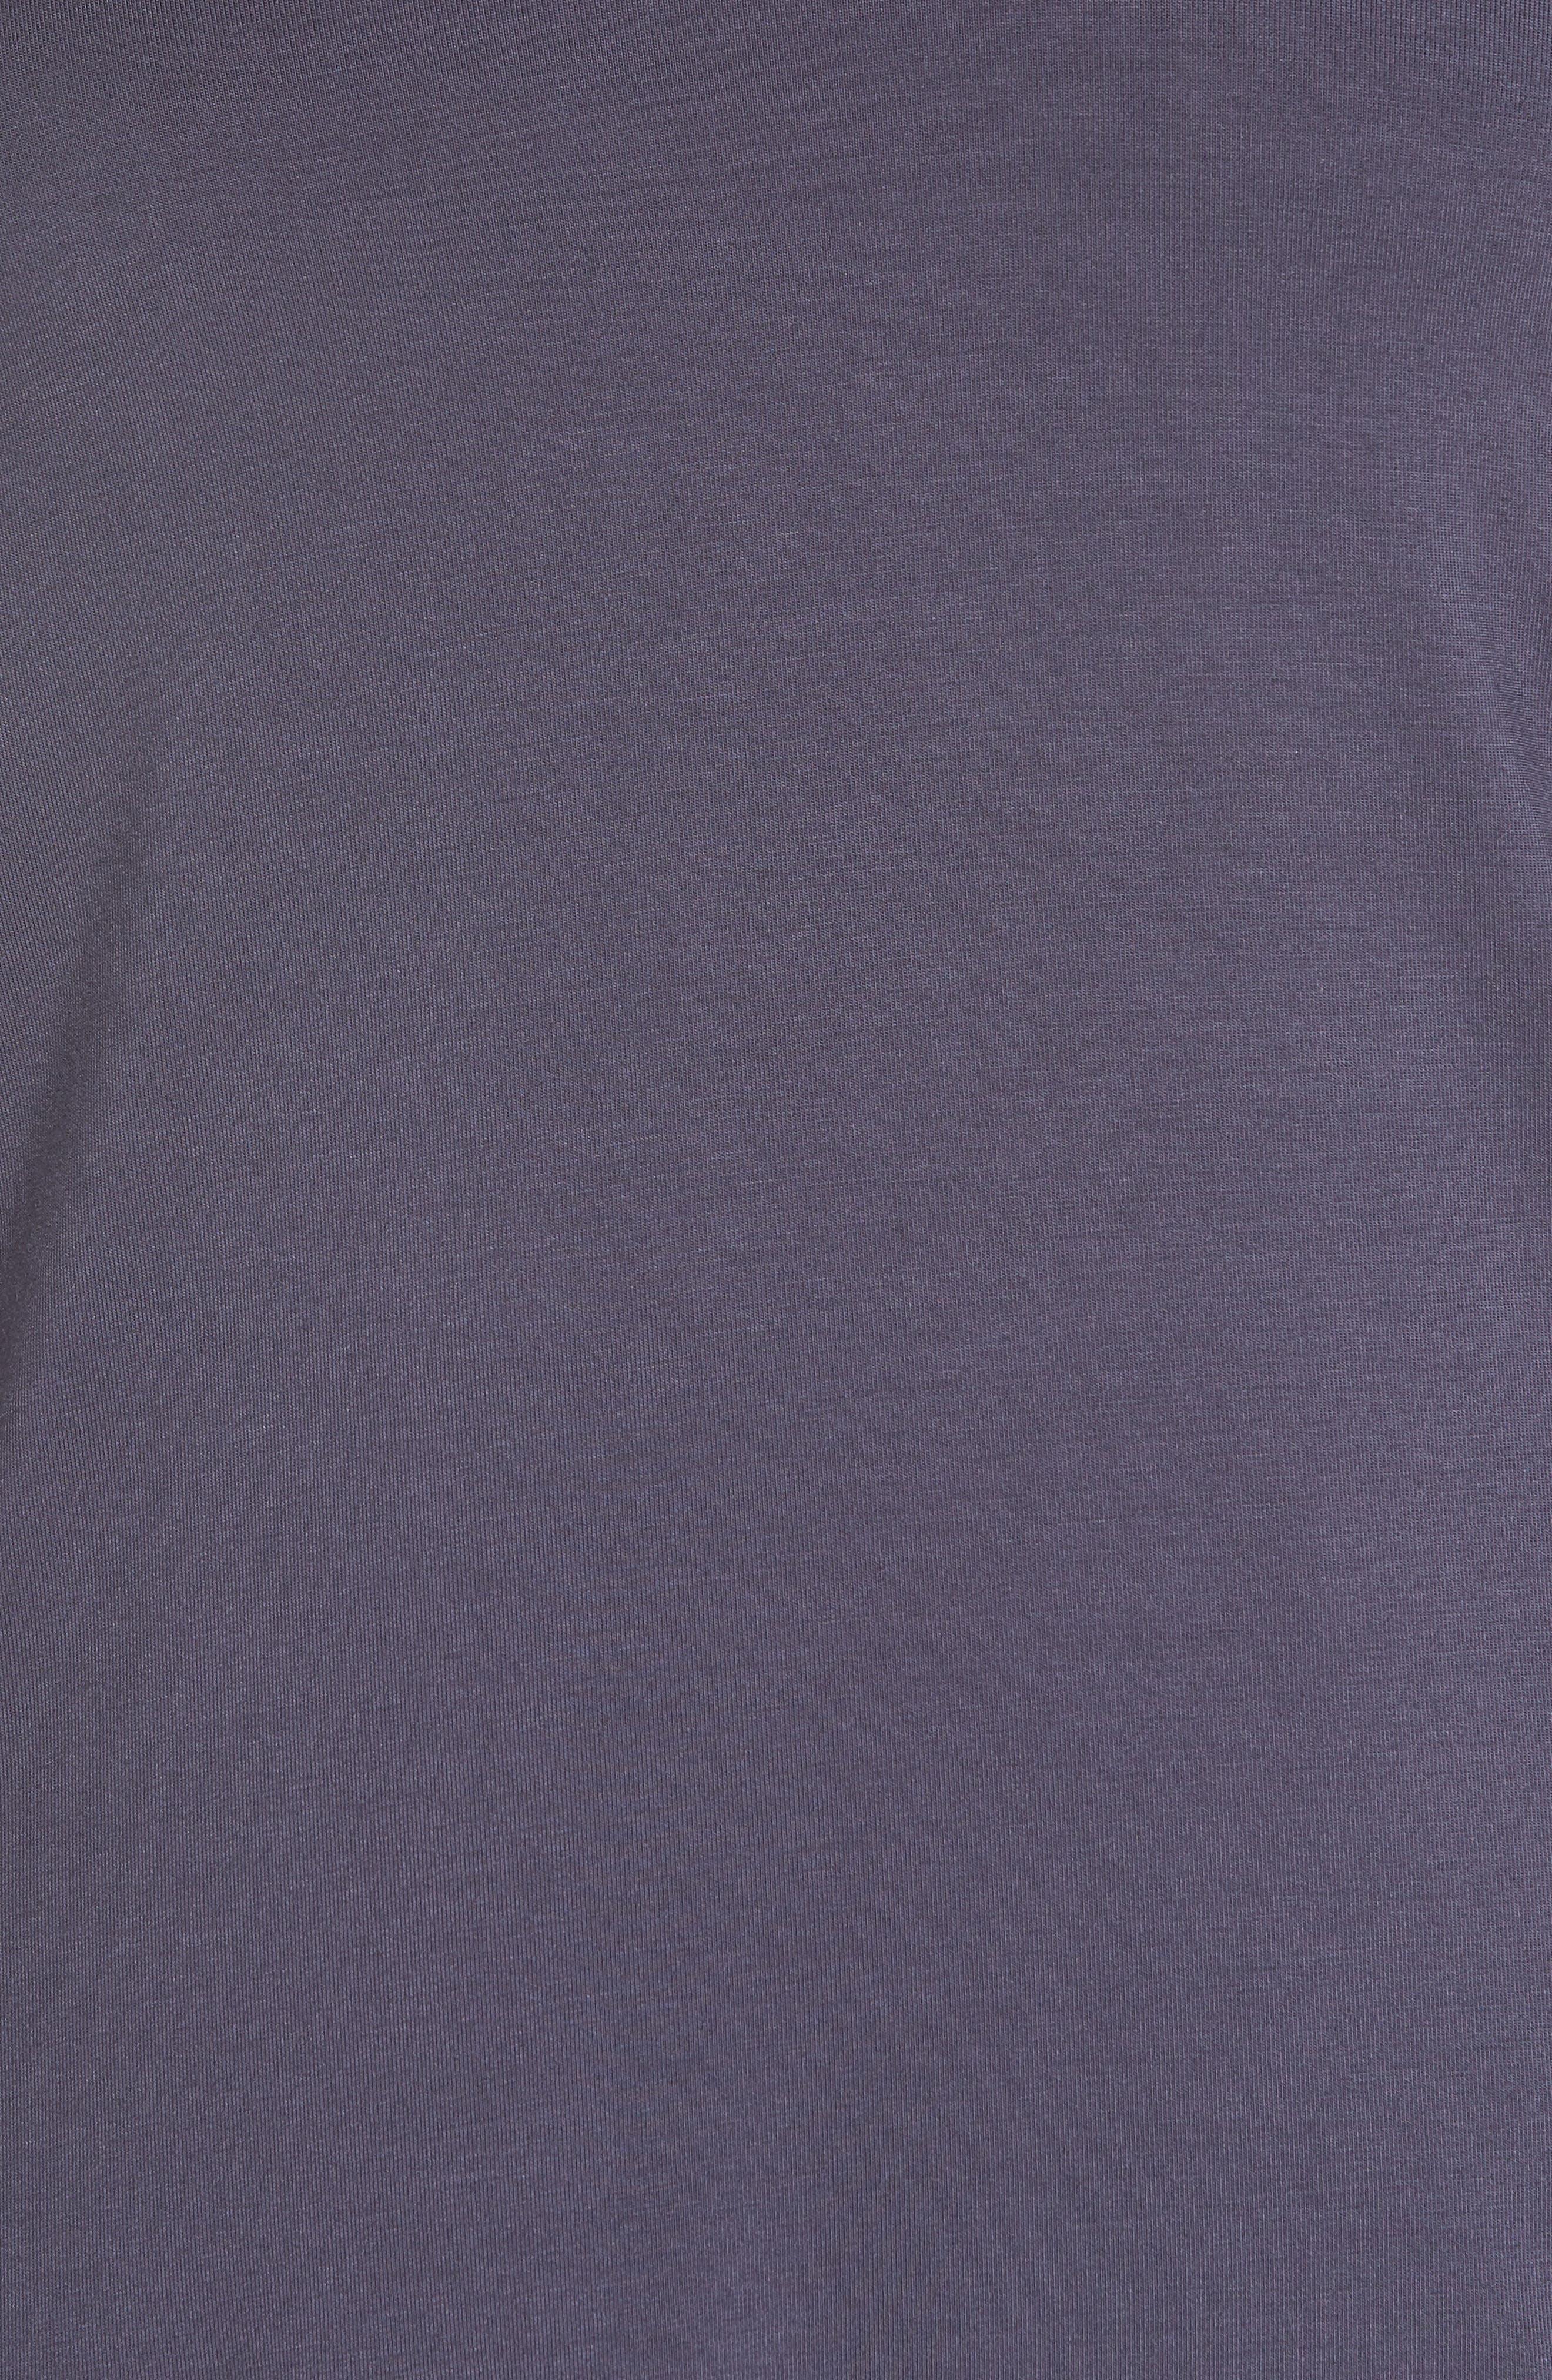 Back Stripe Tee,                             Alternate thumbnail 5, color,                             Charcoal Grey/ White